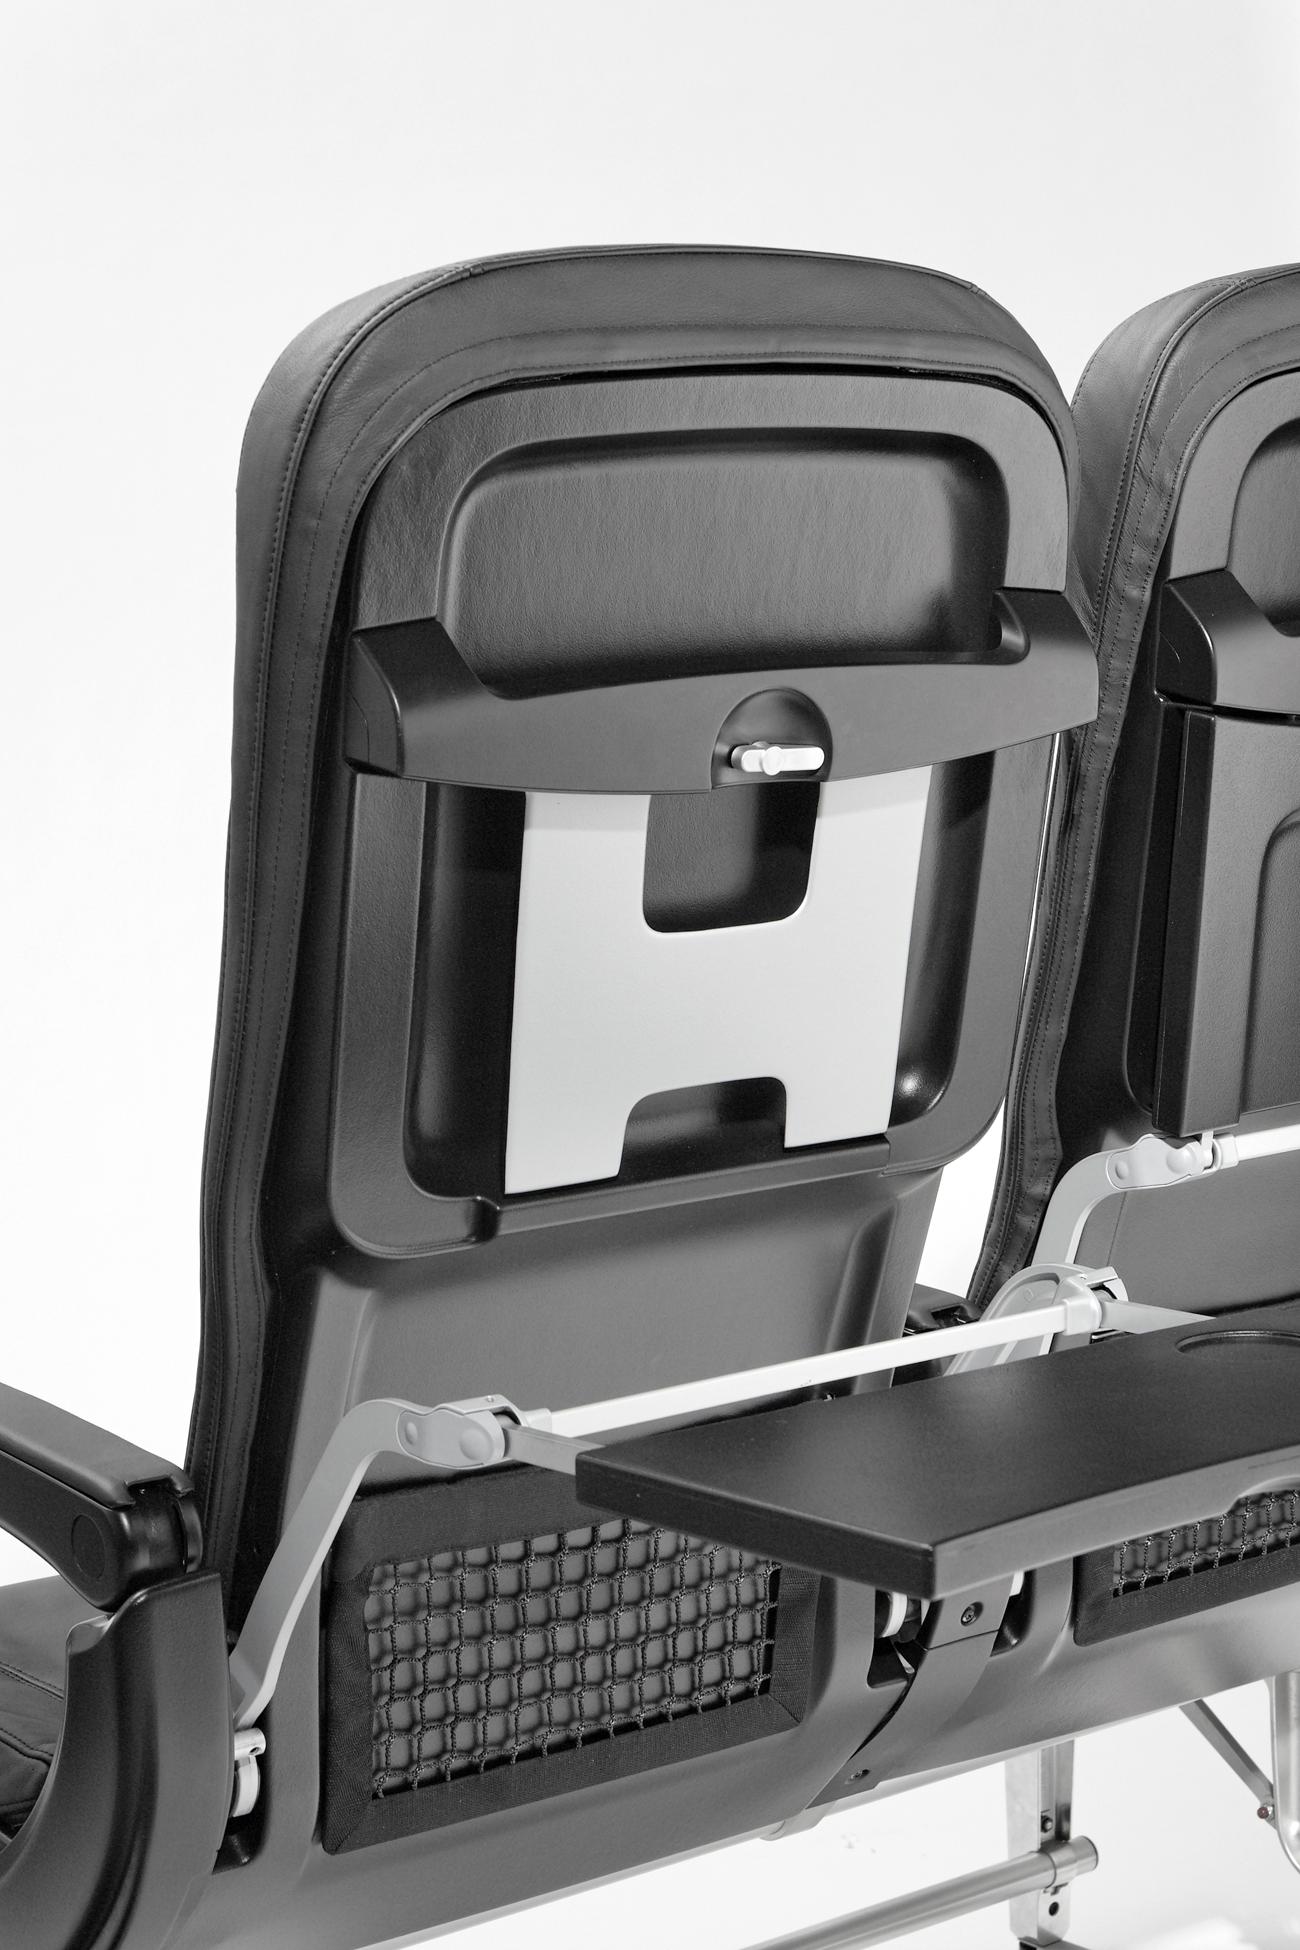 Economic Interior Design Ideas: Basic Line 3520 Economy Class Seat